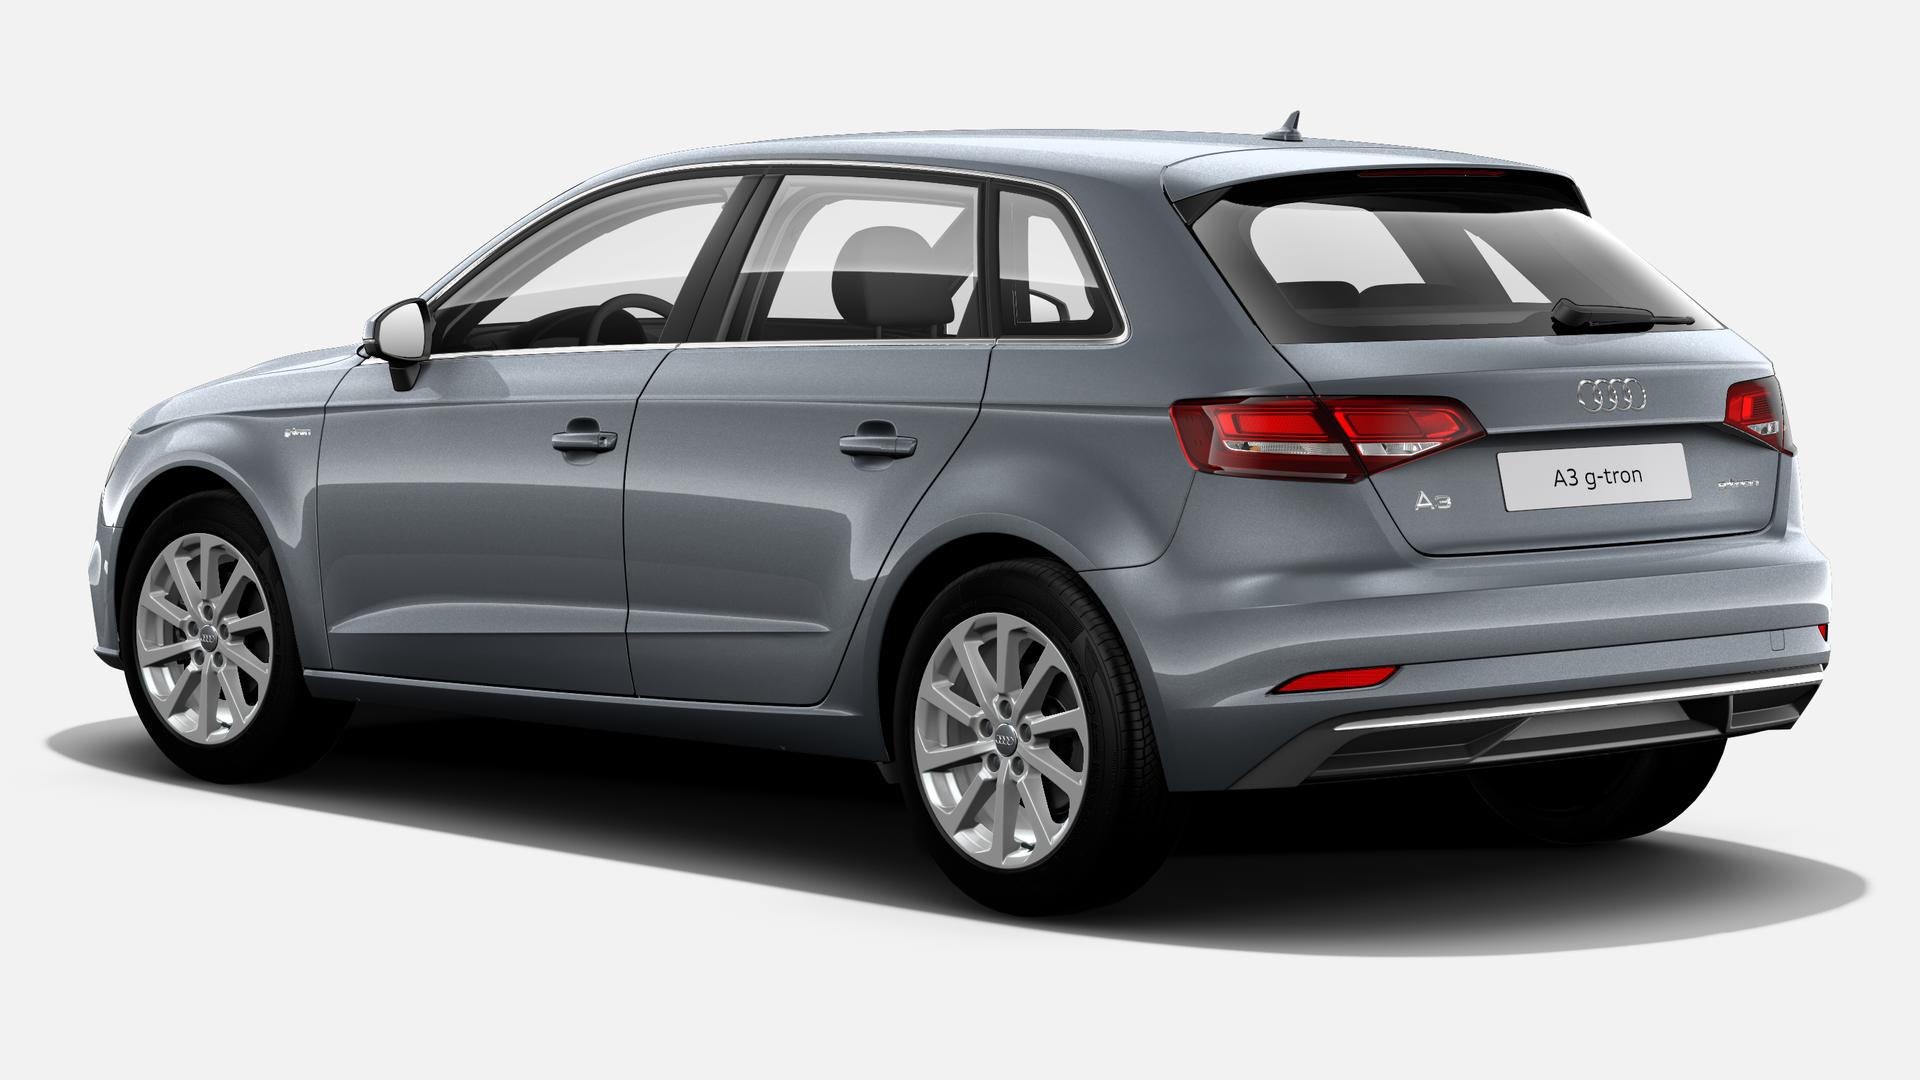 Audi A3 Sportback 1.4 TFSI g-tron Design Edition 81 kW (110 CV)